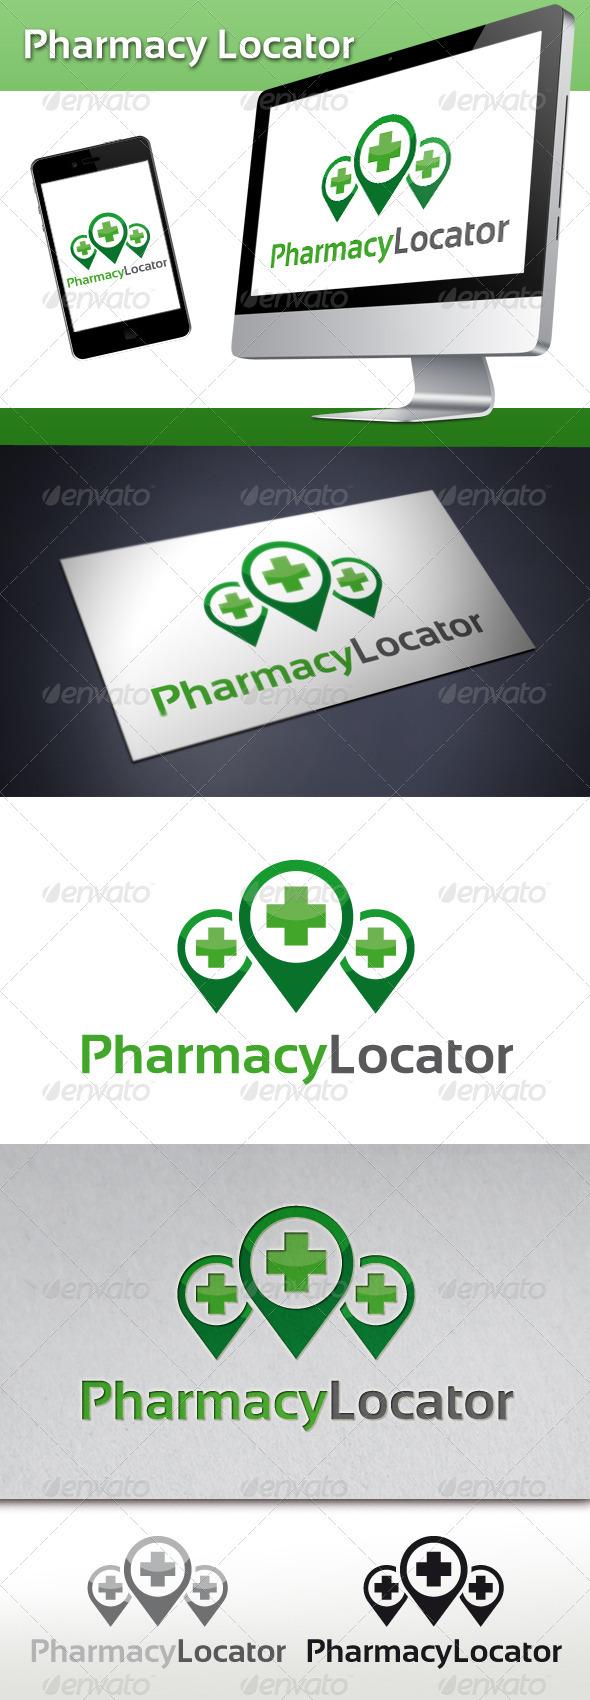 GraphicRiver Pharmacy Locator Logo 3289949